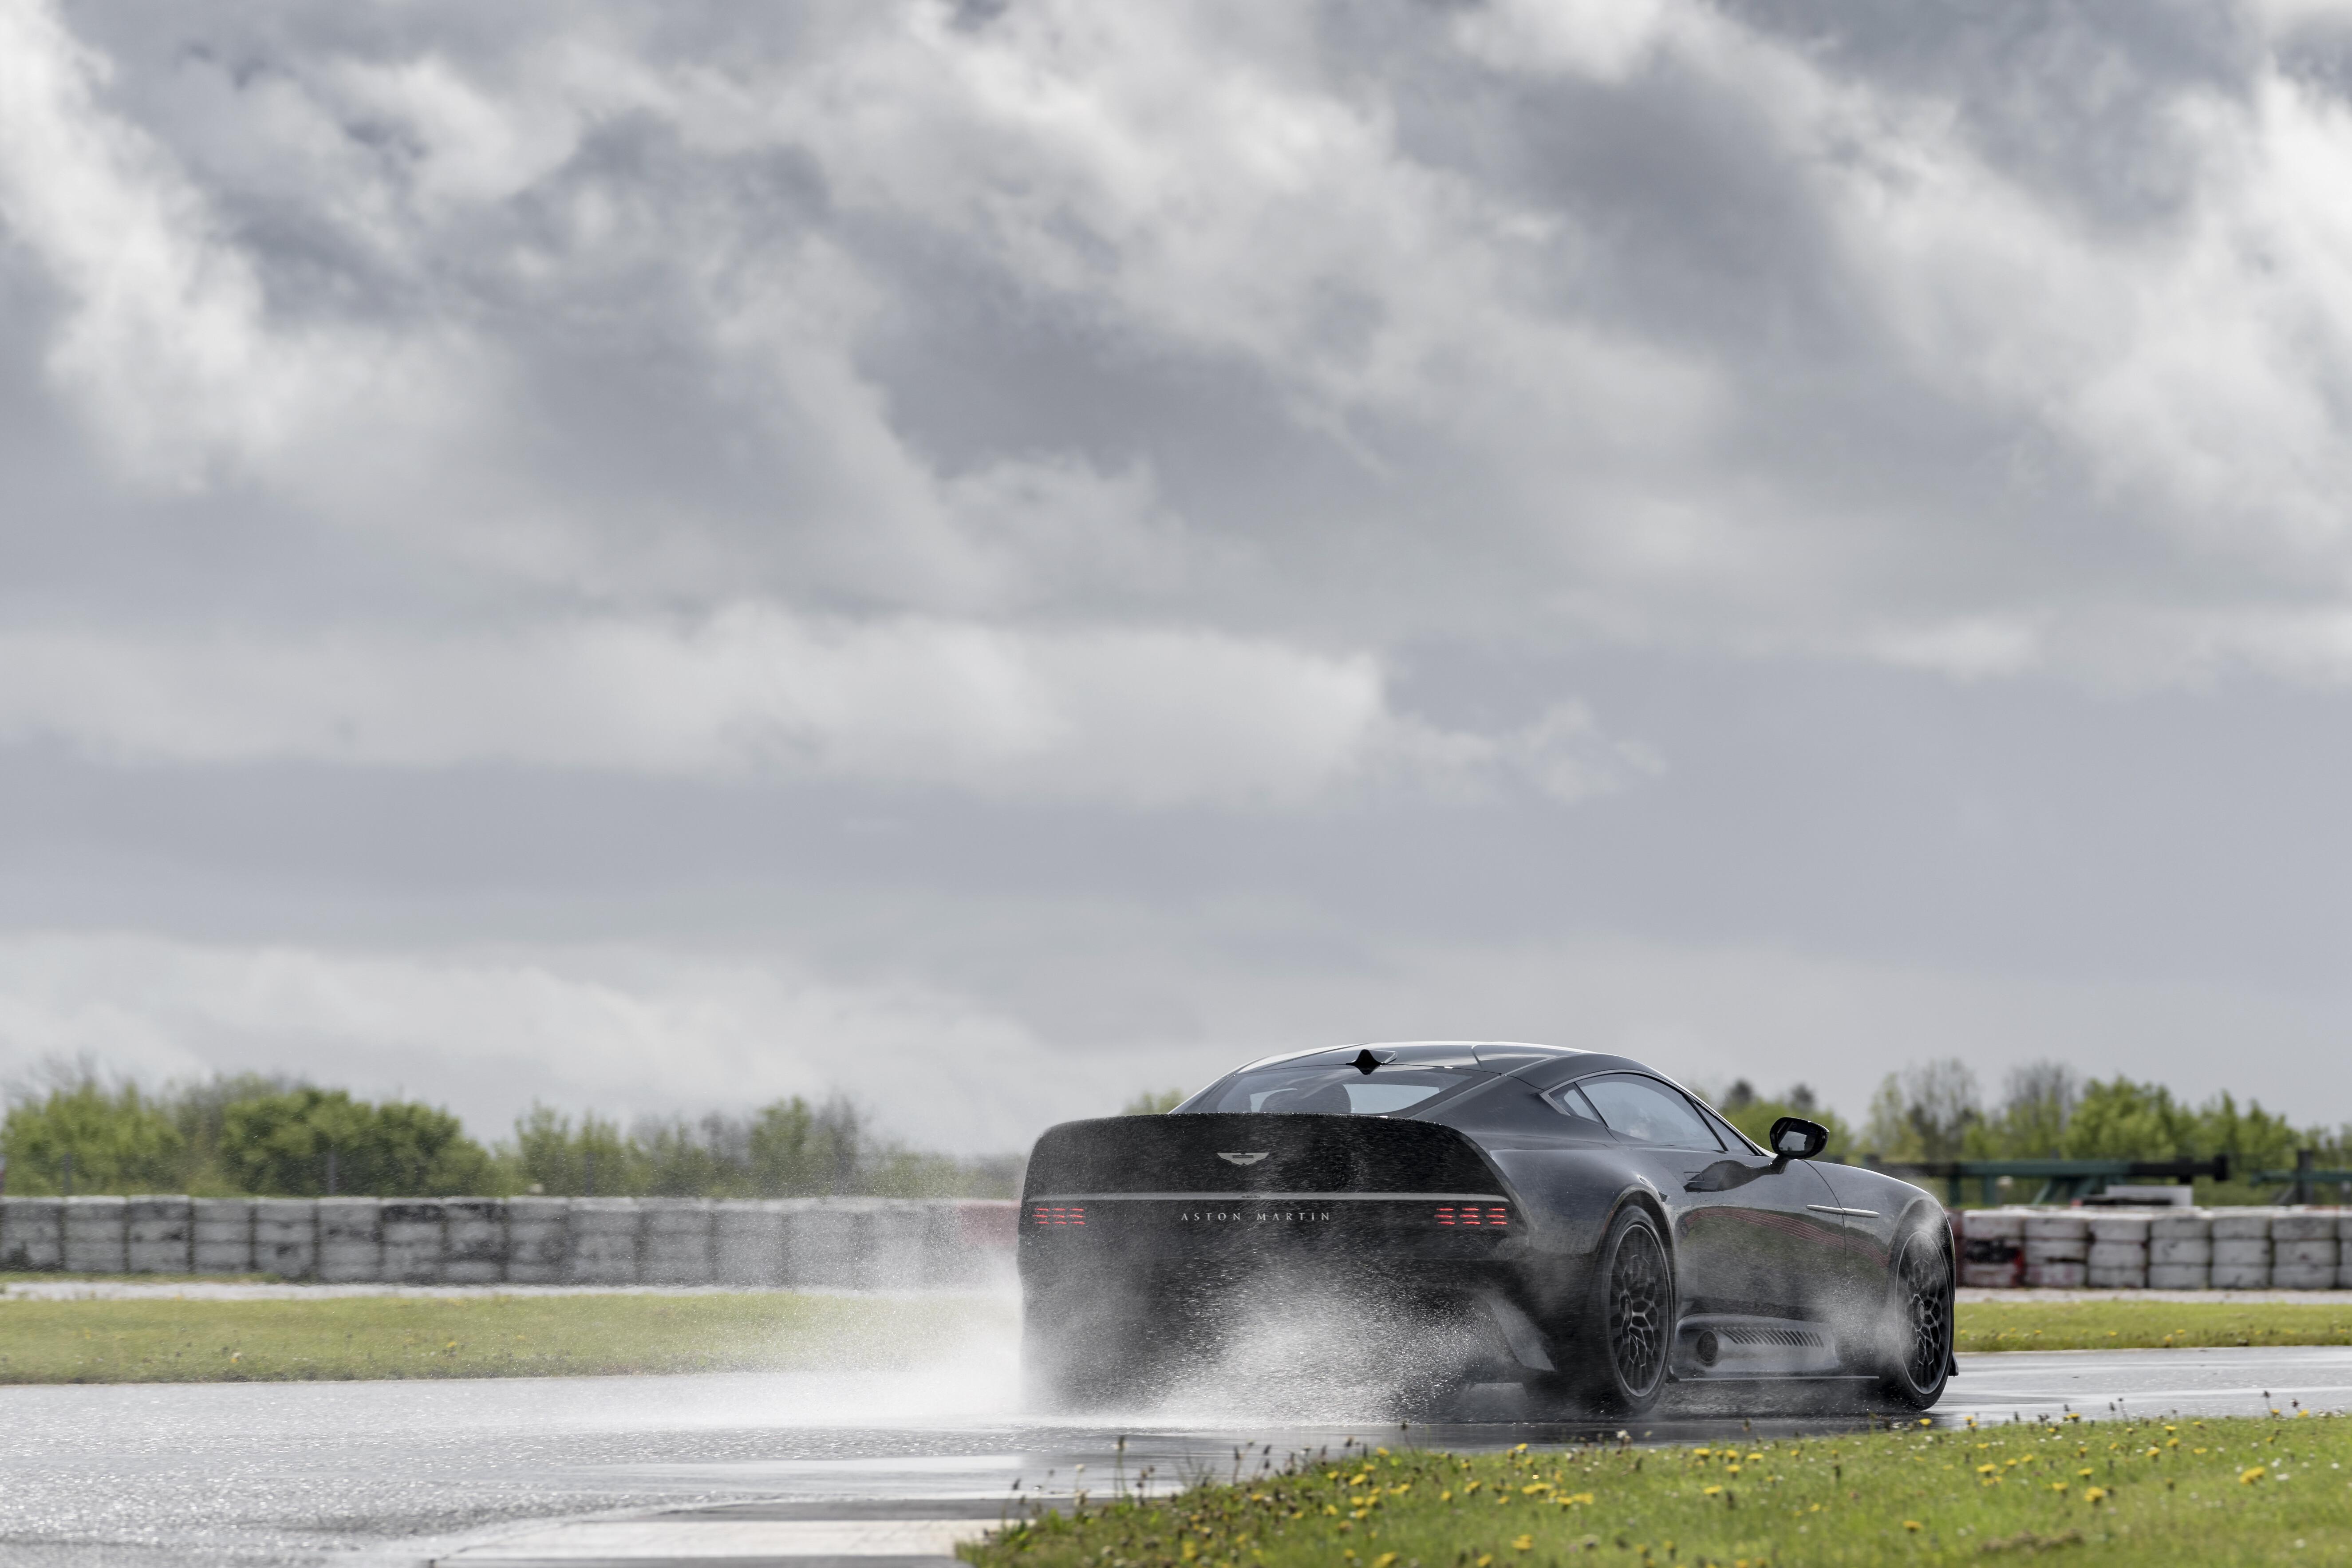 Motor Reviews Kyle Fortune Aston Martin Victor Photo Max Earey 144